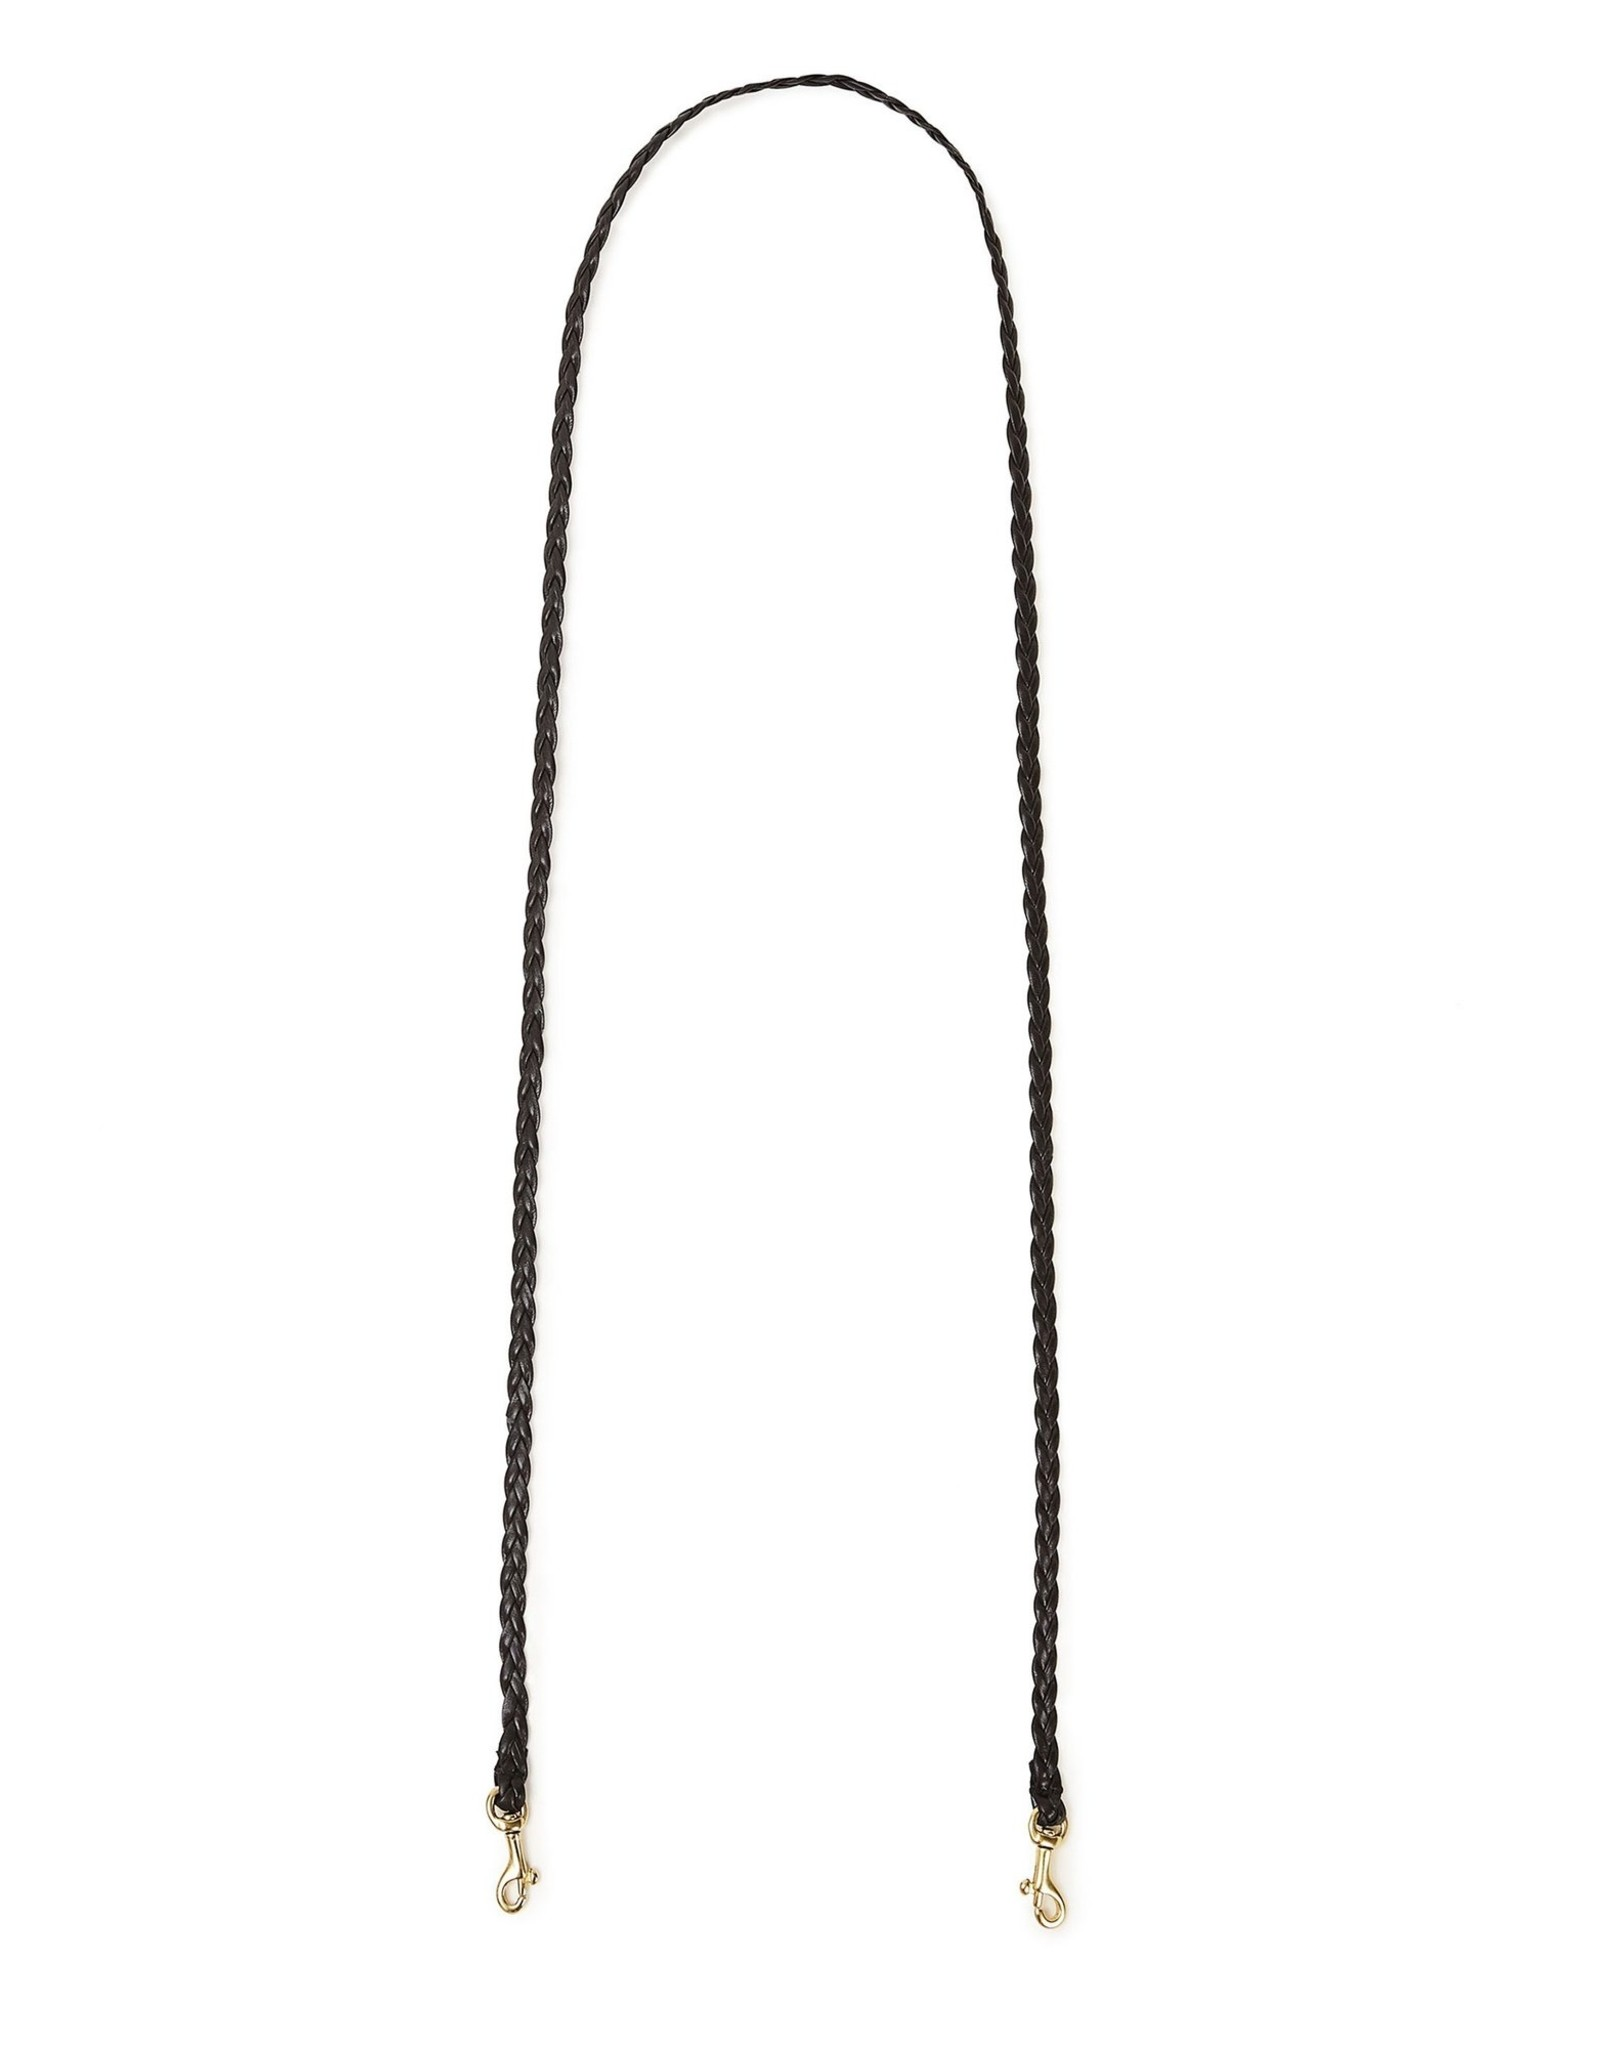 Clare V Mini Braid Black Crossbody Strap